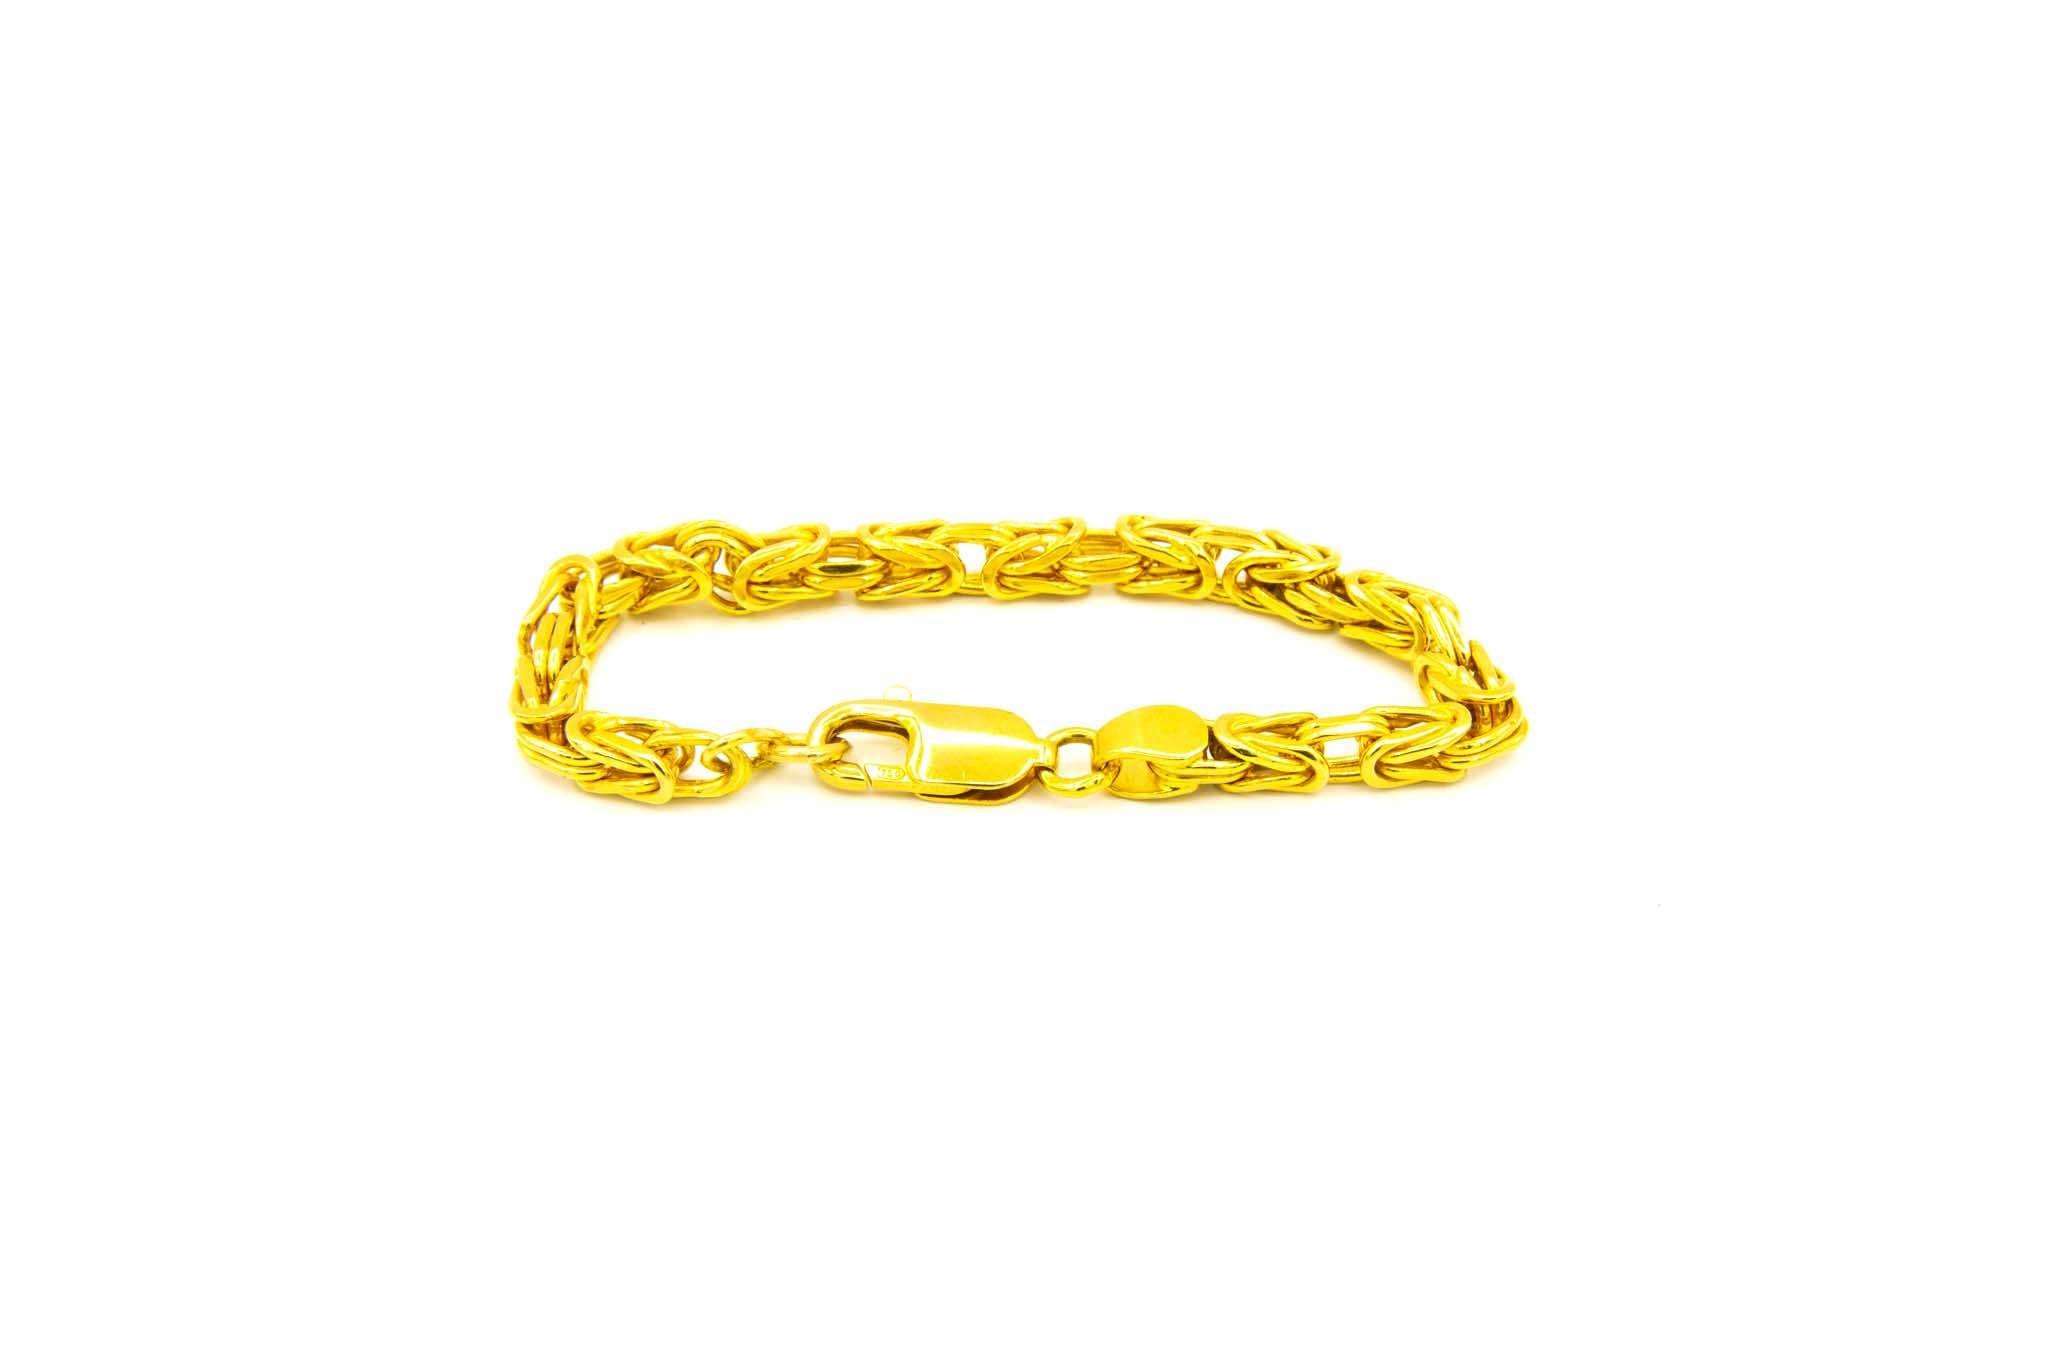 Armband met vierkante koningsschakel-2